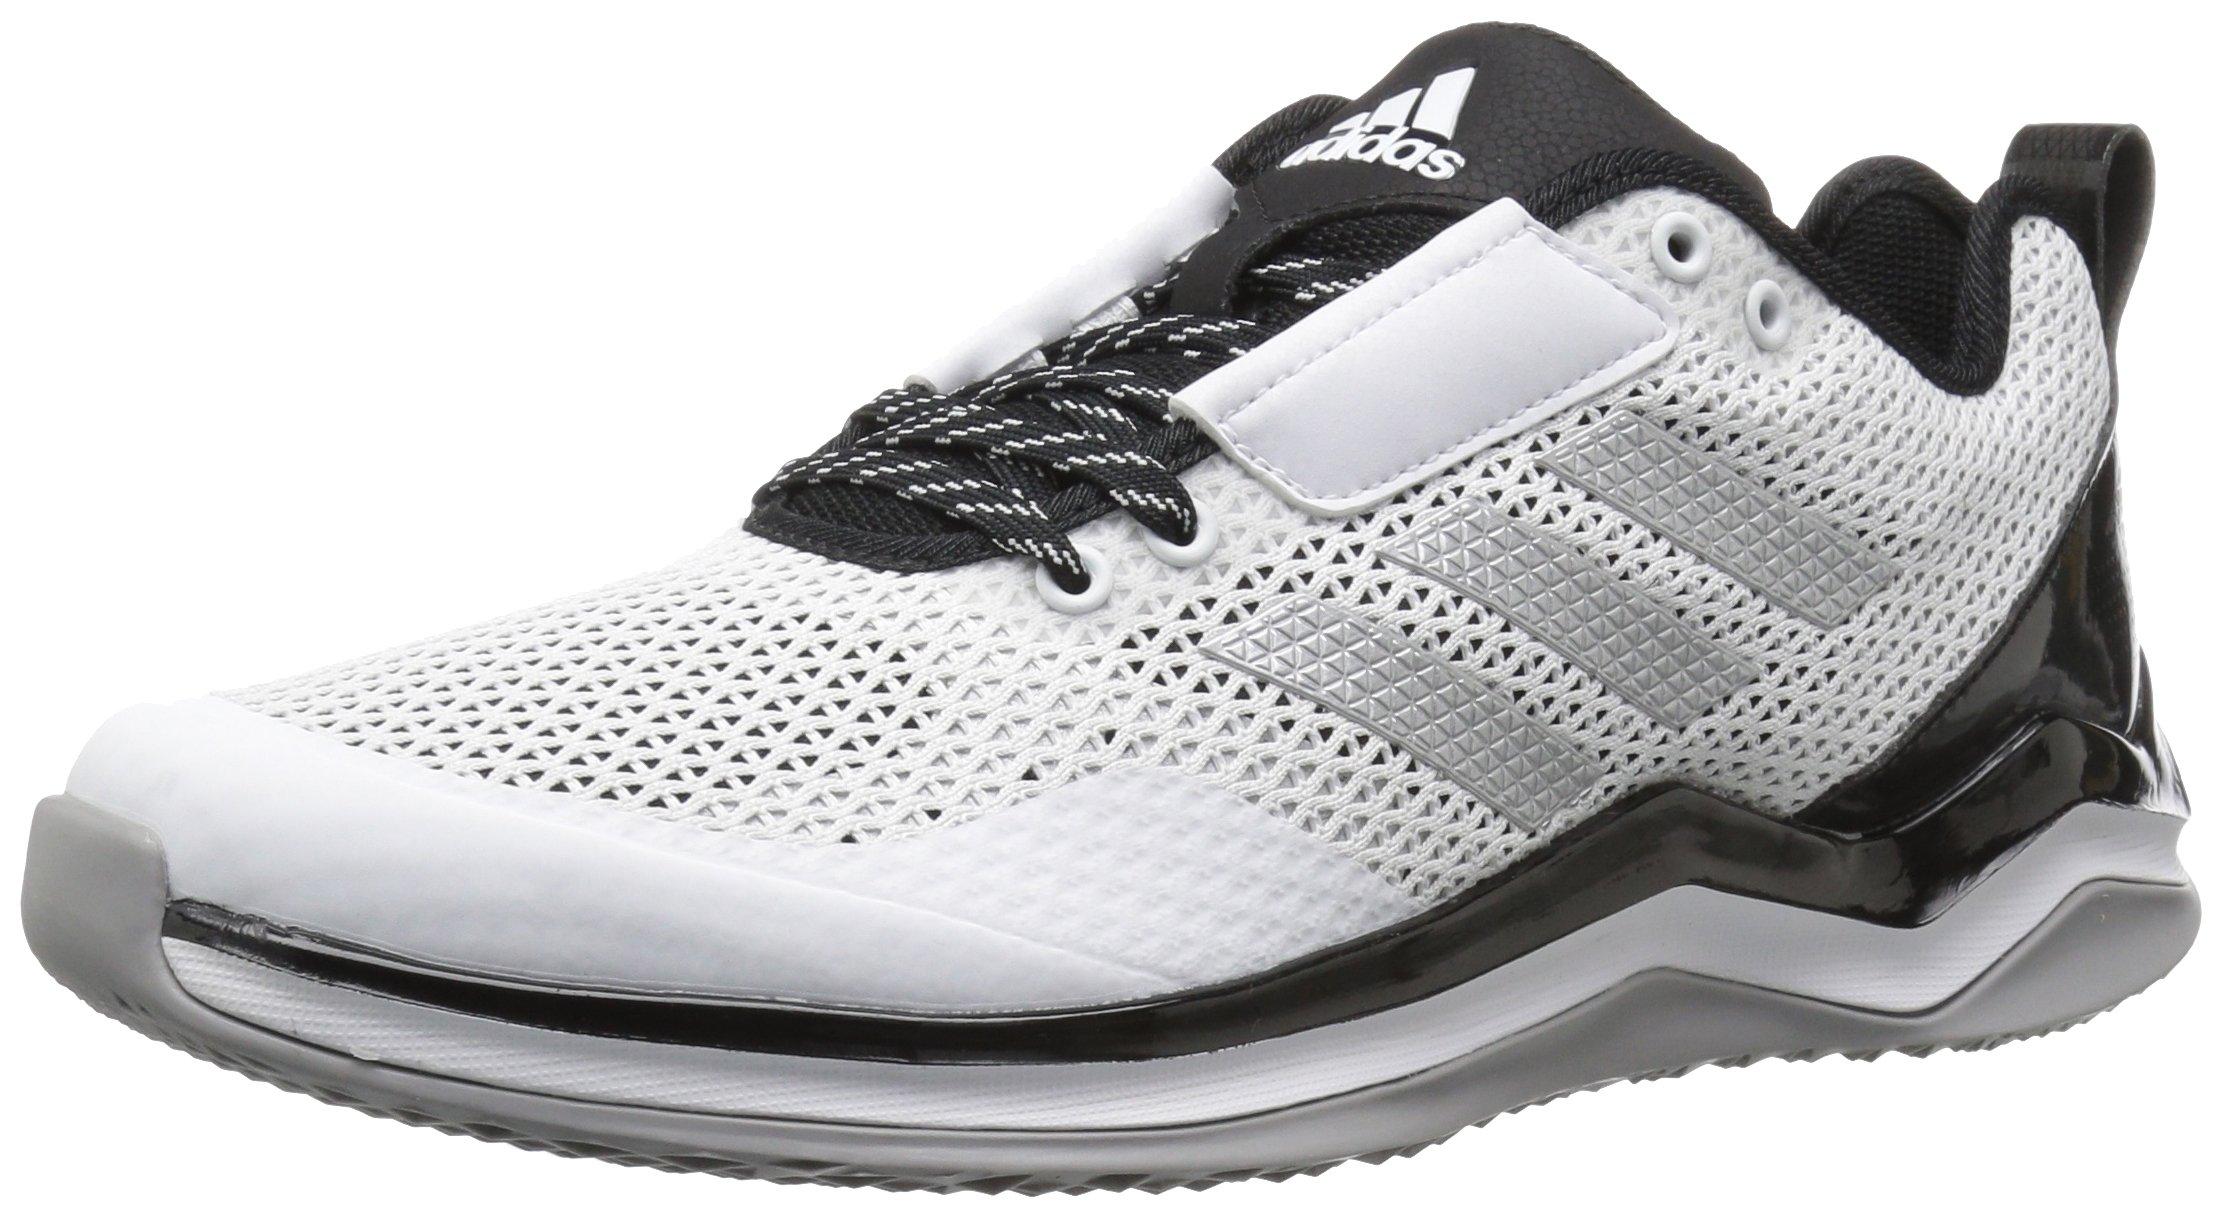 adidas Men's Freak X Carbon Mid Cross Trainer, White/Metallic Silver/Black, (11 M US)